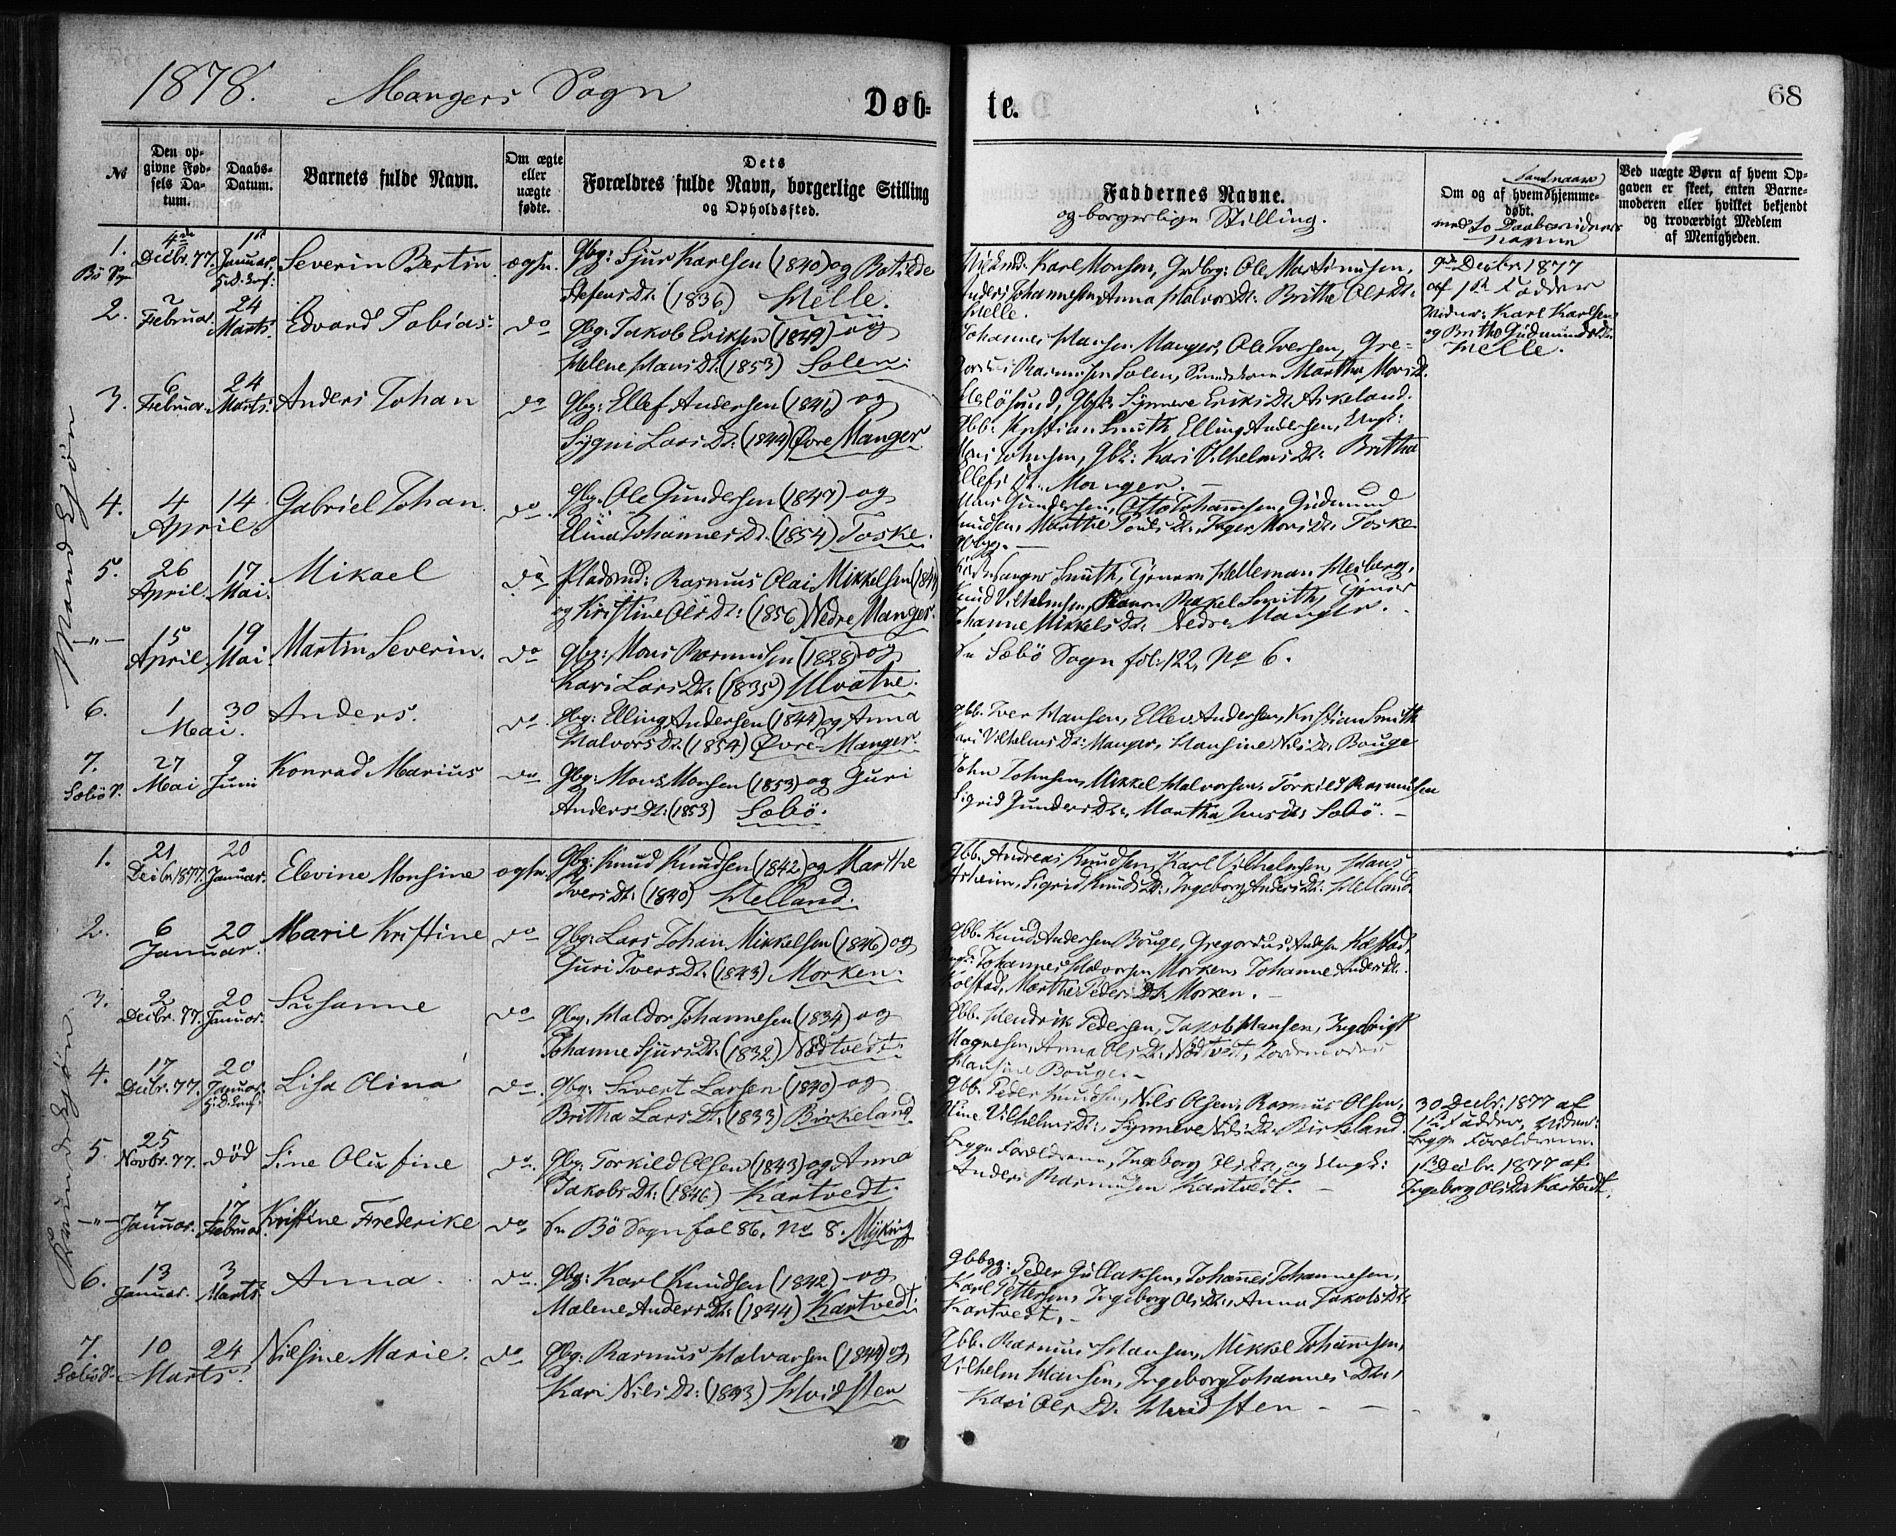 SAB, Manger sokneprestembete, H/Haa: Ministerialbok nr. A 8, 1871-1880, s. 68